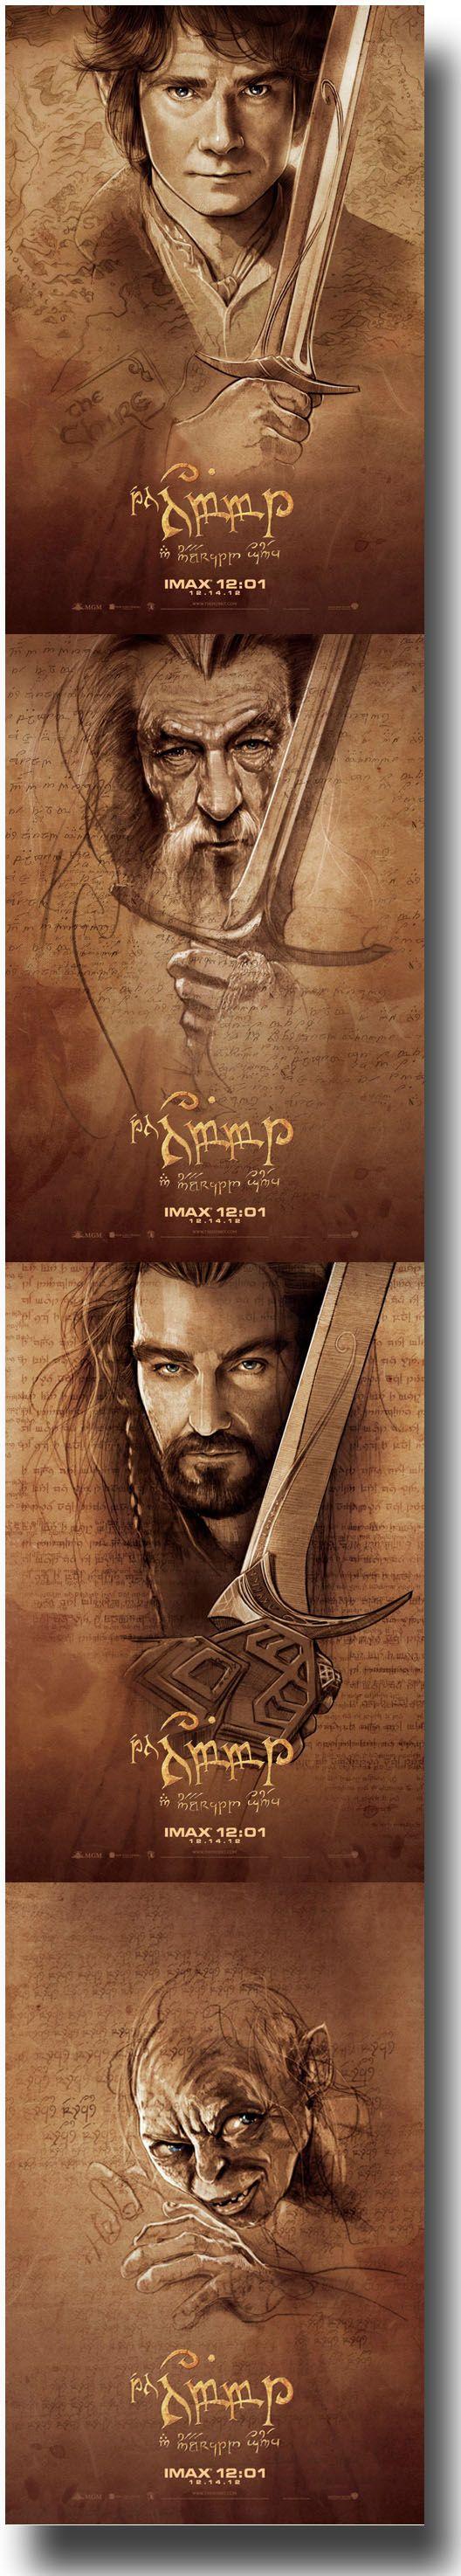 All 4 Imax Midnight screening posters for the Hobbit  Bilbo/Gandalf/Thorin/Gollum ~ movie posters